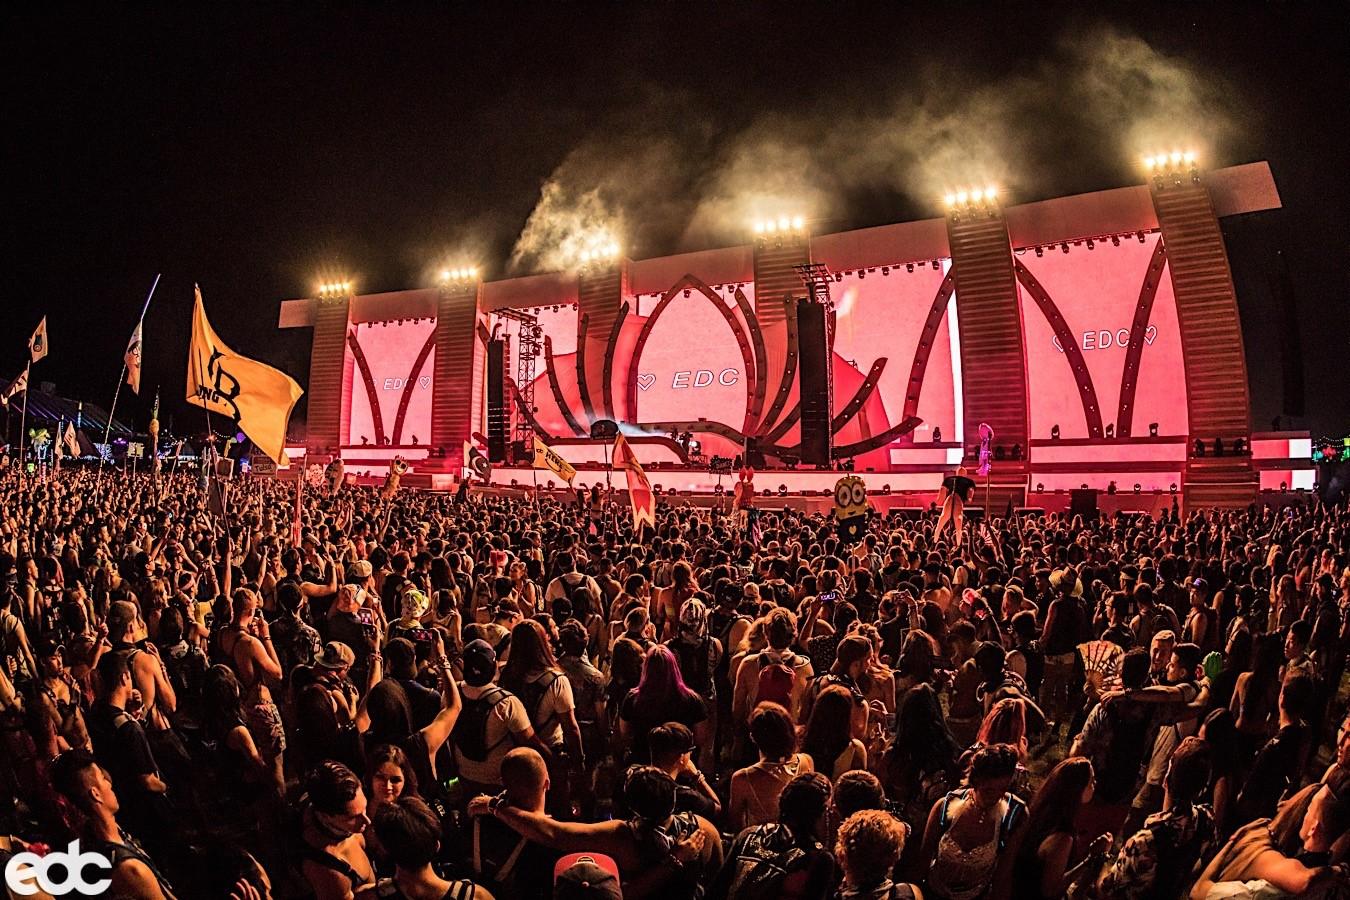 Insomniac Announces EDC Las Vegas 2019 Lineup